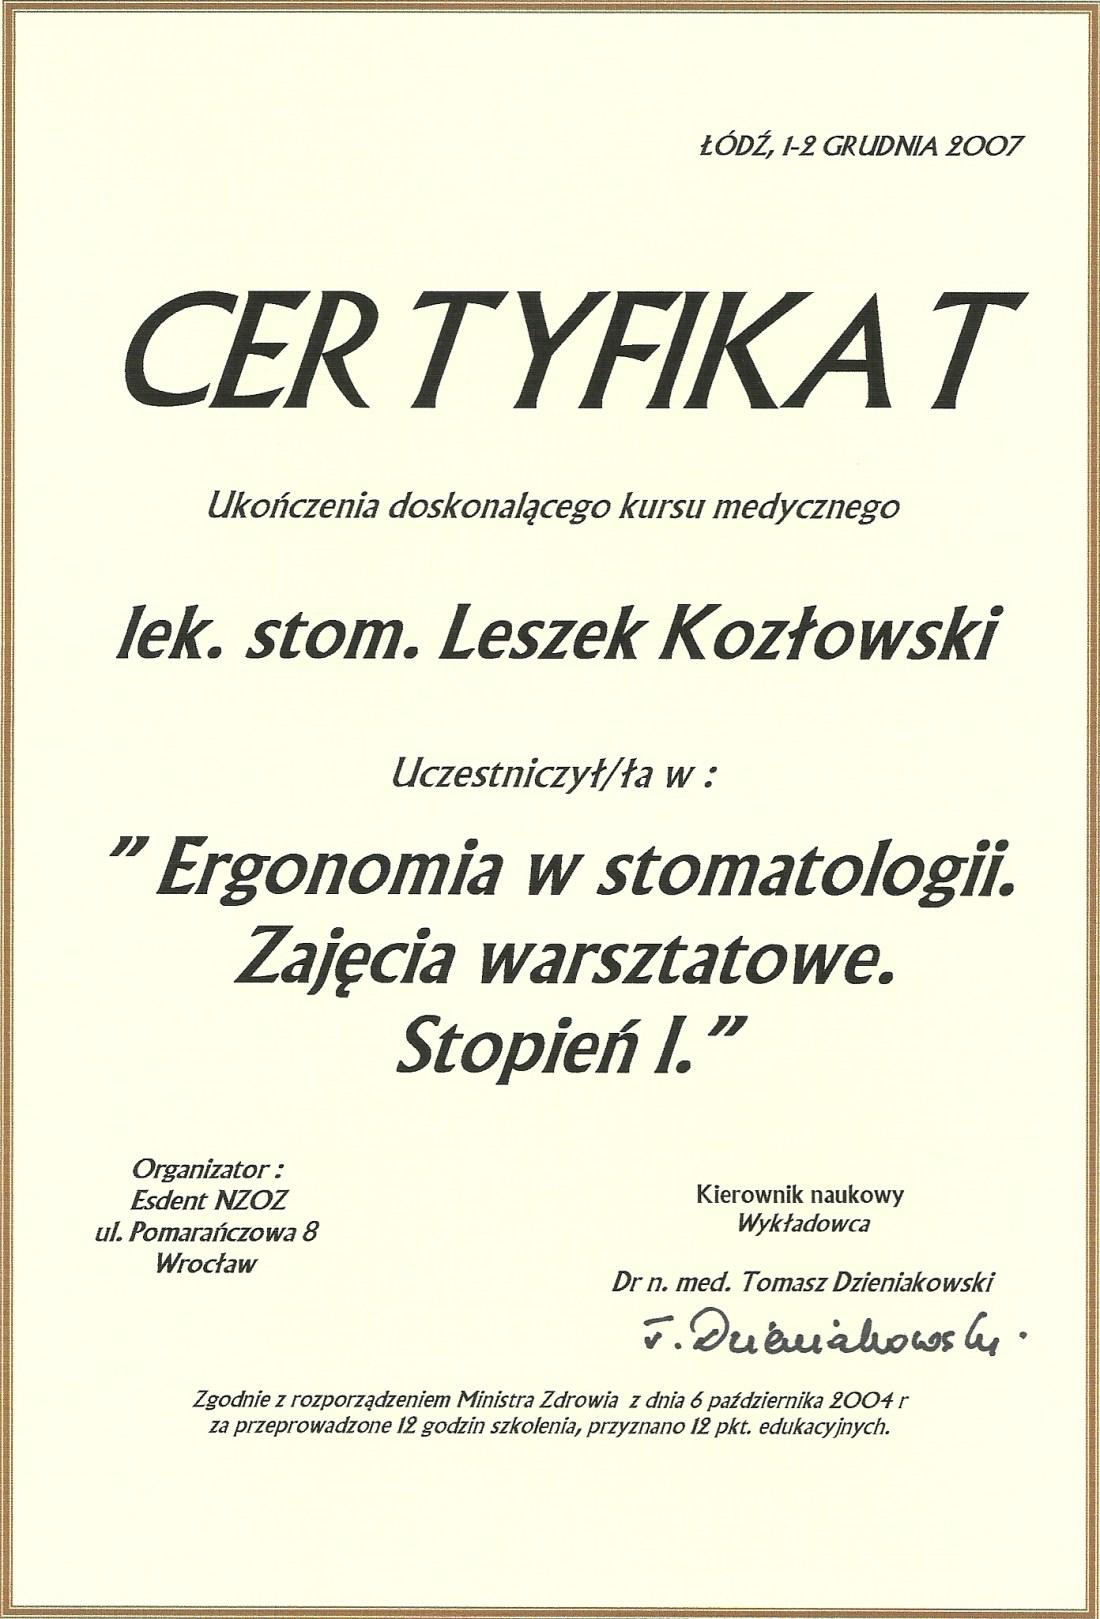 dentysta warszawa DENTYSTA WARSZAWA – DENTOKLINIKA Dentysta warszawa Leszek Kozlowski Certyfikat 1